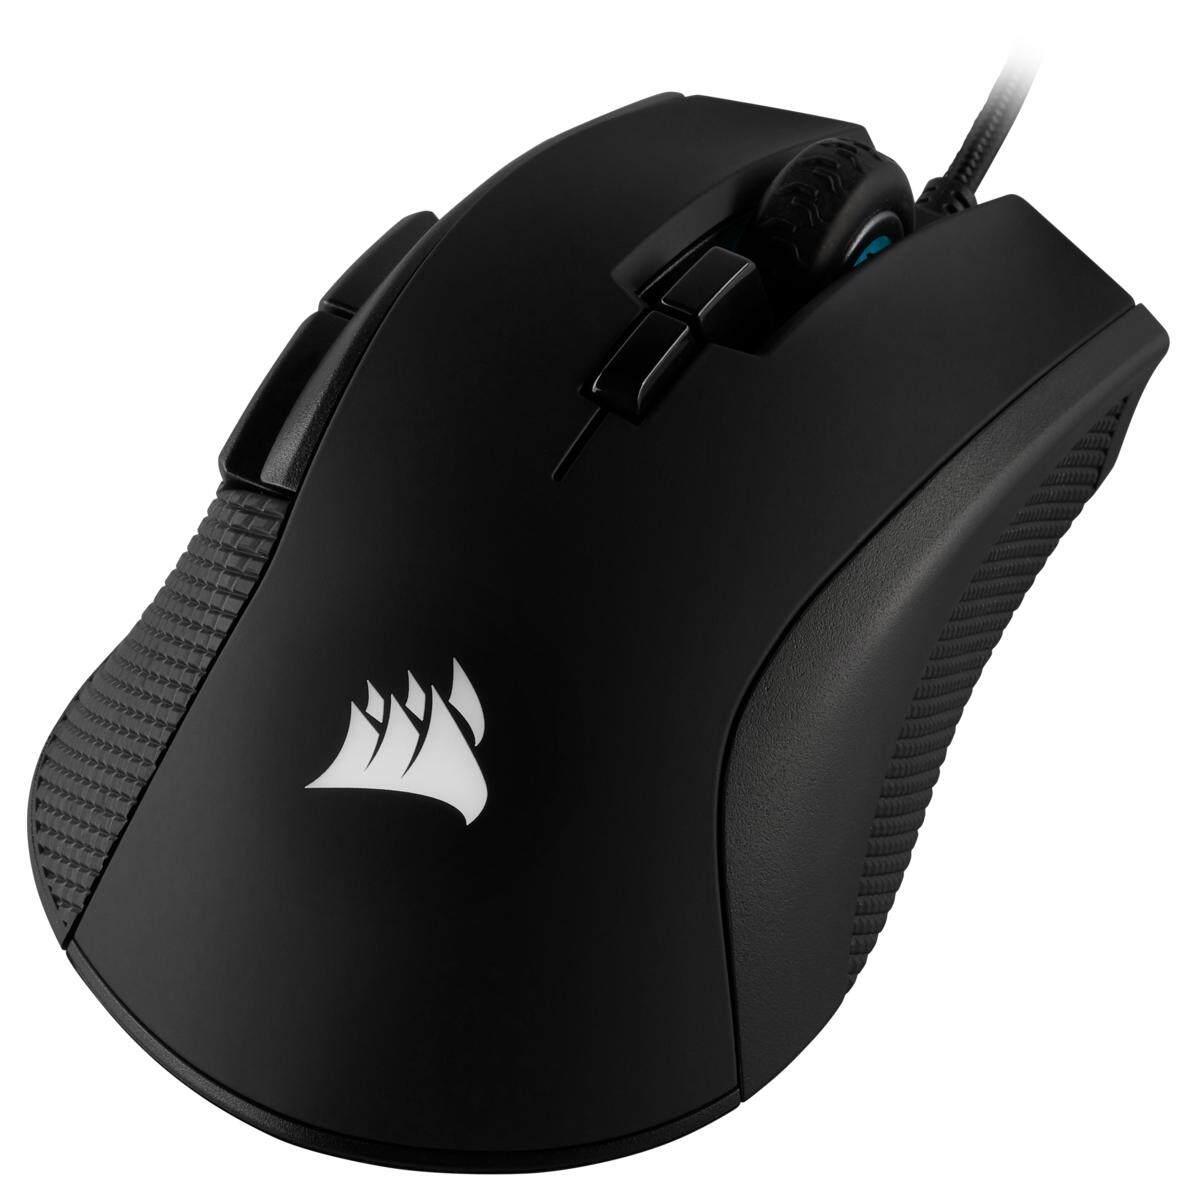 Corsair Ironclaw RGB FPS/MOBA Gaming Mouse- Black, Backlit RGB LED, 18000 DPI, Optical